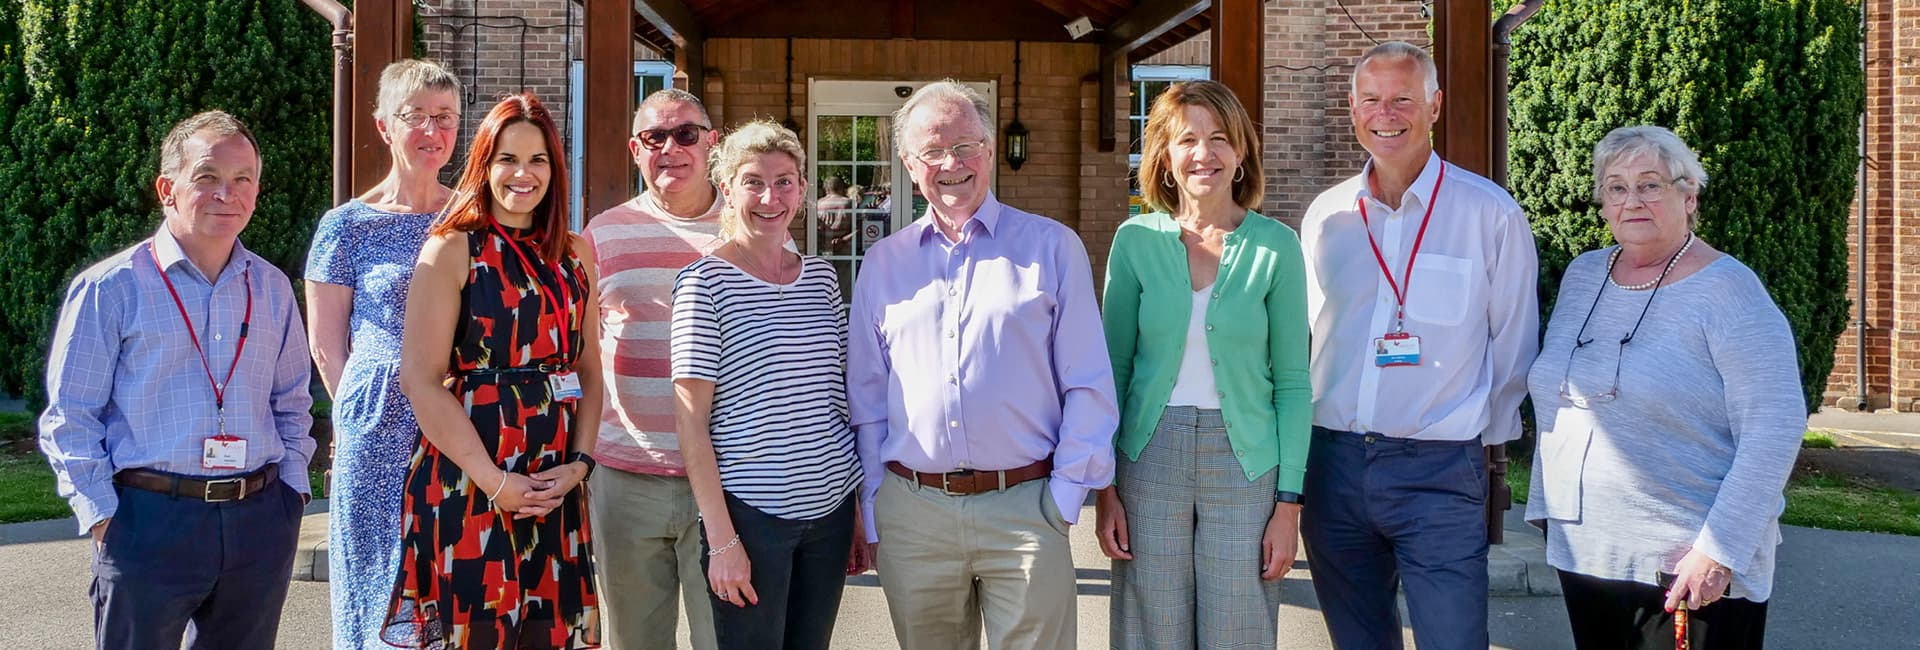 The Myton Hospices - Meet the Team - Trustees - Flex Slider